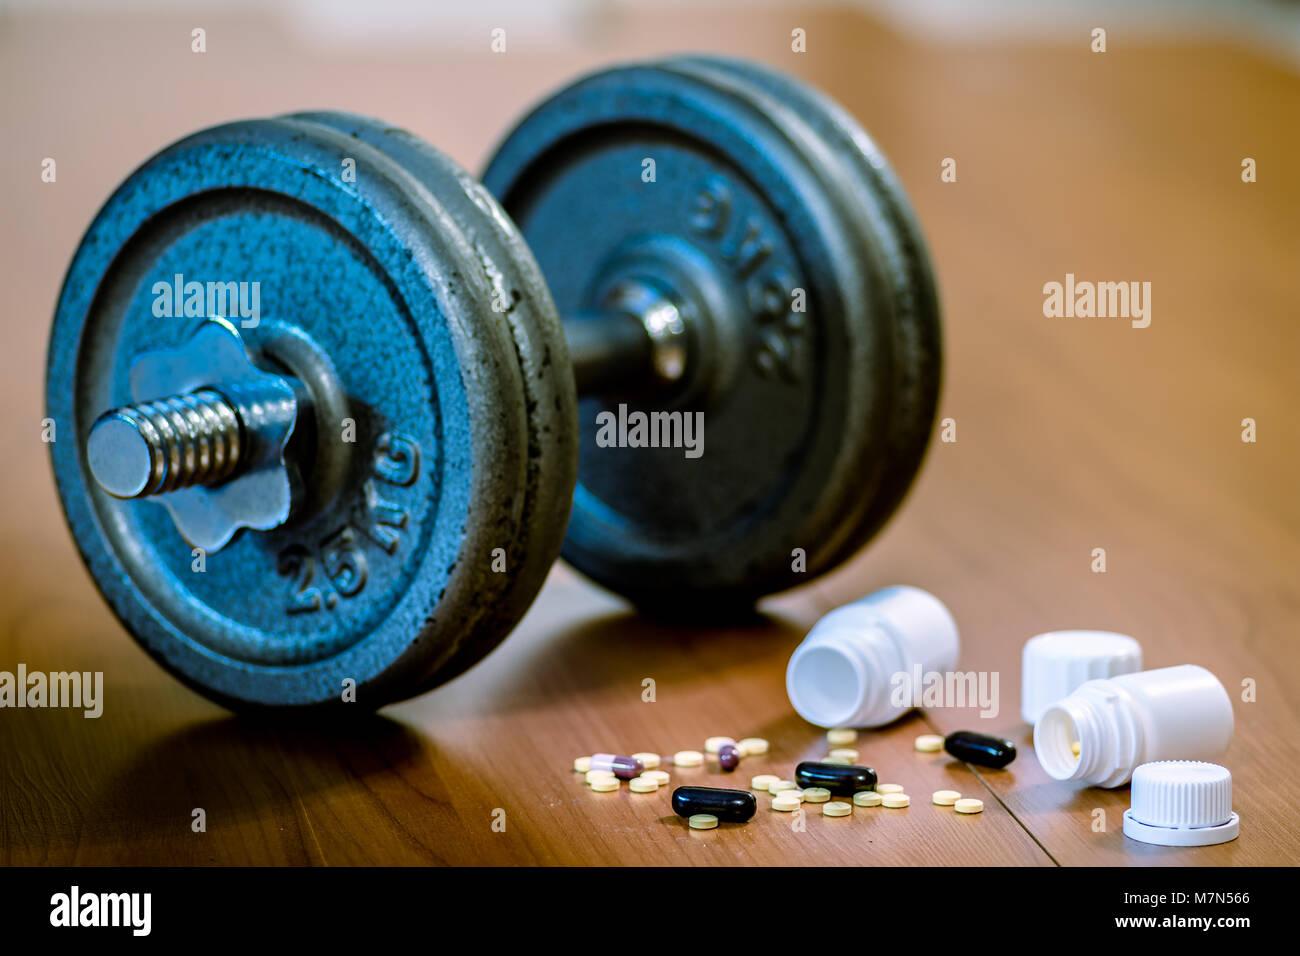 steroid stockfotos steroid bilder alamy. Black Bedroom Furniture Sets. Home Design Ideas